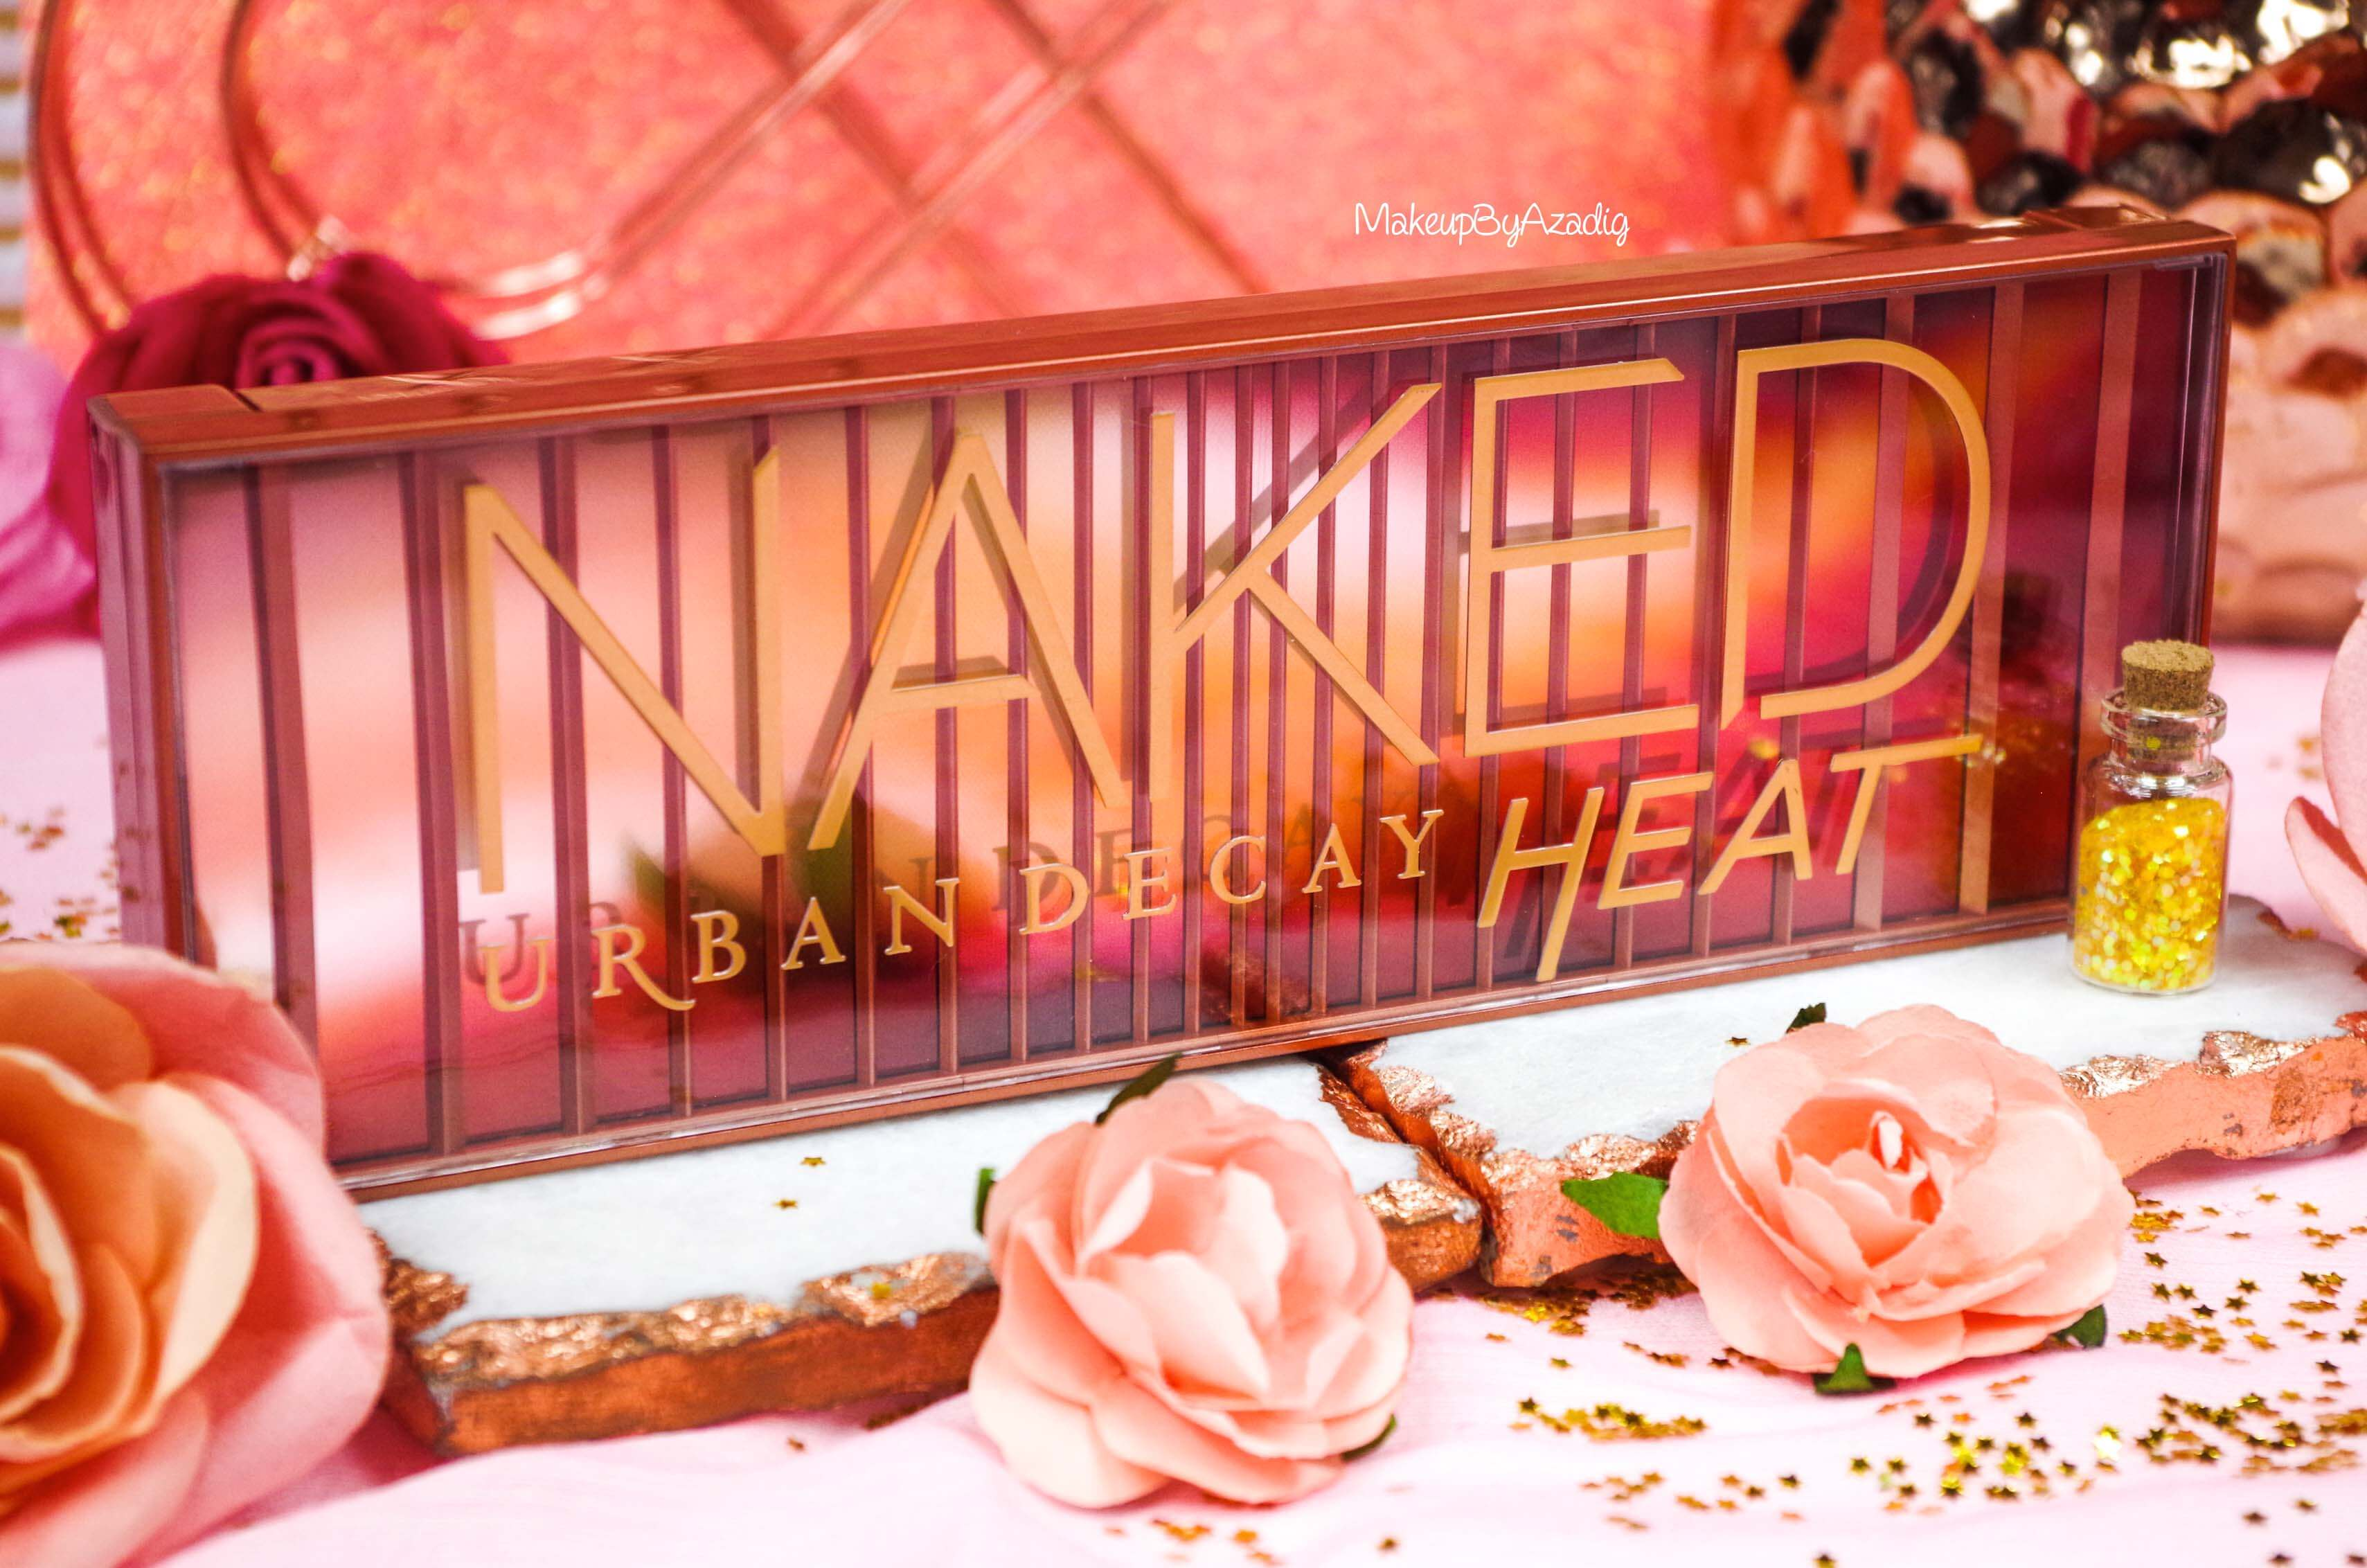 revue-review-nouvelle-palette-naked-heat-urban-decay-sephora-avis-prix-france-makeupbyazadig-swatch-magnifique